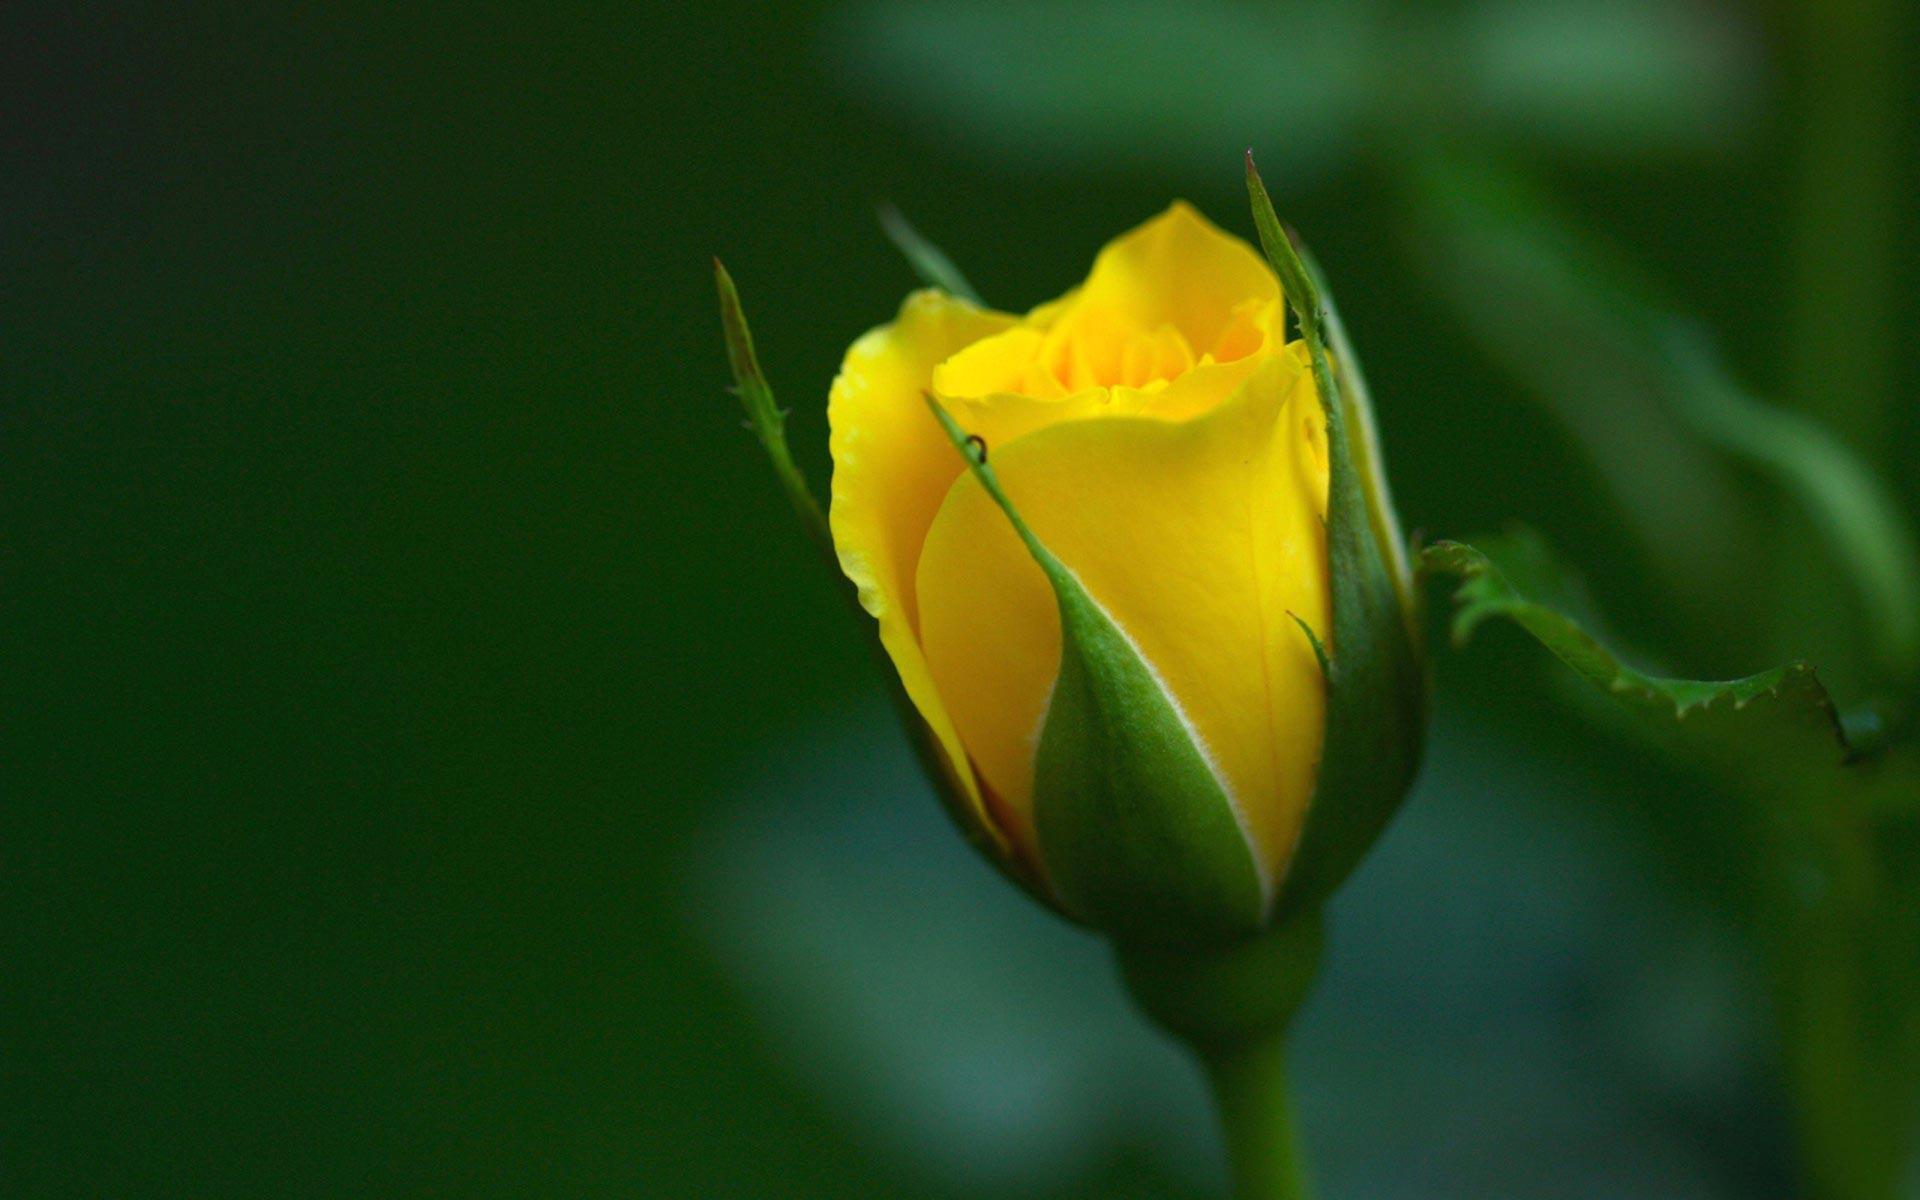 Hd wallpaper yellow rose - Yellow Rose Wallpapers Hd Wallpapers Inn